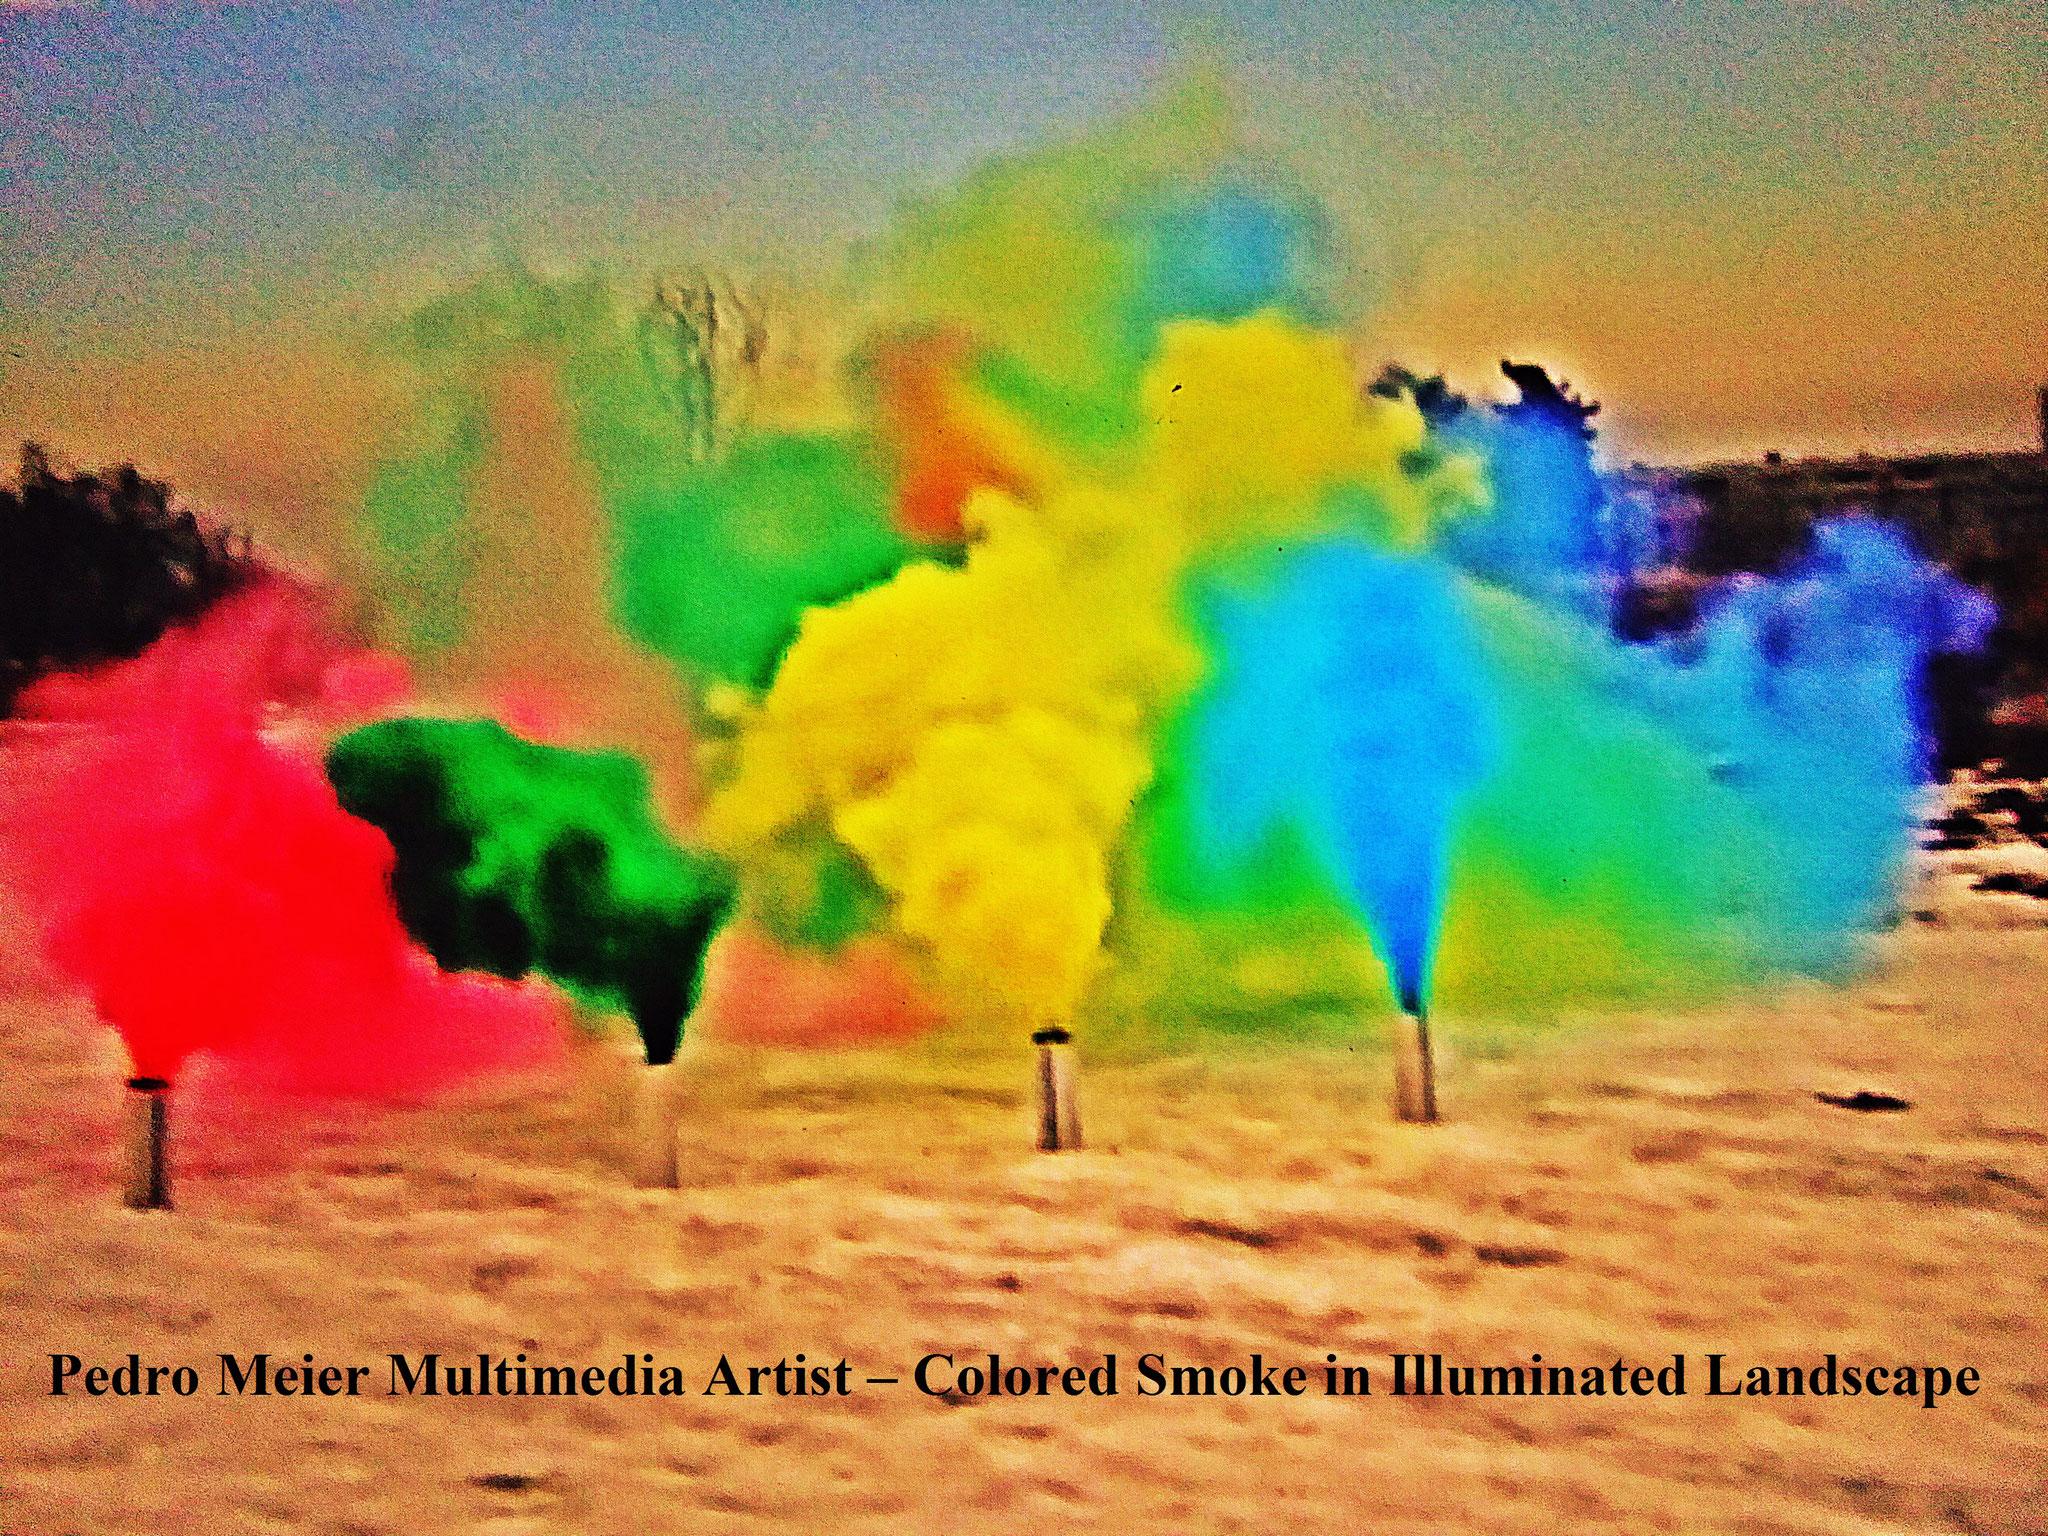 Colored Smoke in illuminated Landscape – by Pedro Meier Multimedia Artist 2017 – Niederbipp, Olten, Switzerland – Bangkok, Land art, minimal art, conceptual art, Earth art, spirituality, Member VISARTE, IAA AIAP UNESCO, Artforum, © P. Meier / ProLitteris